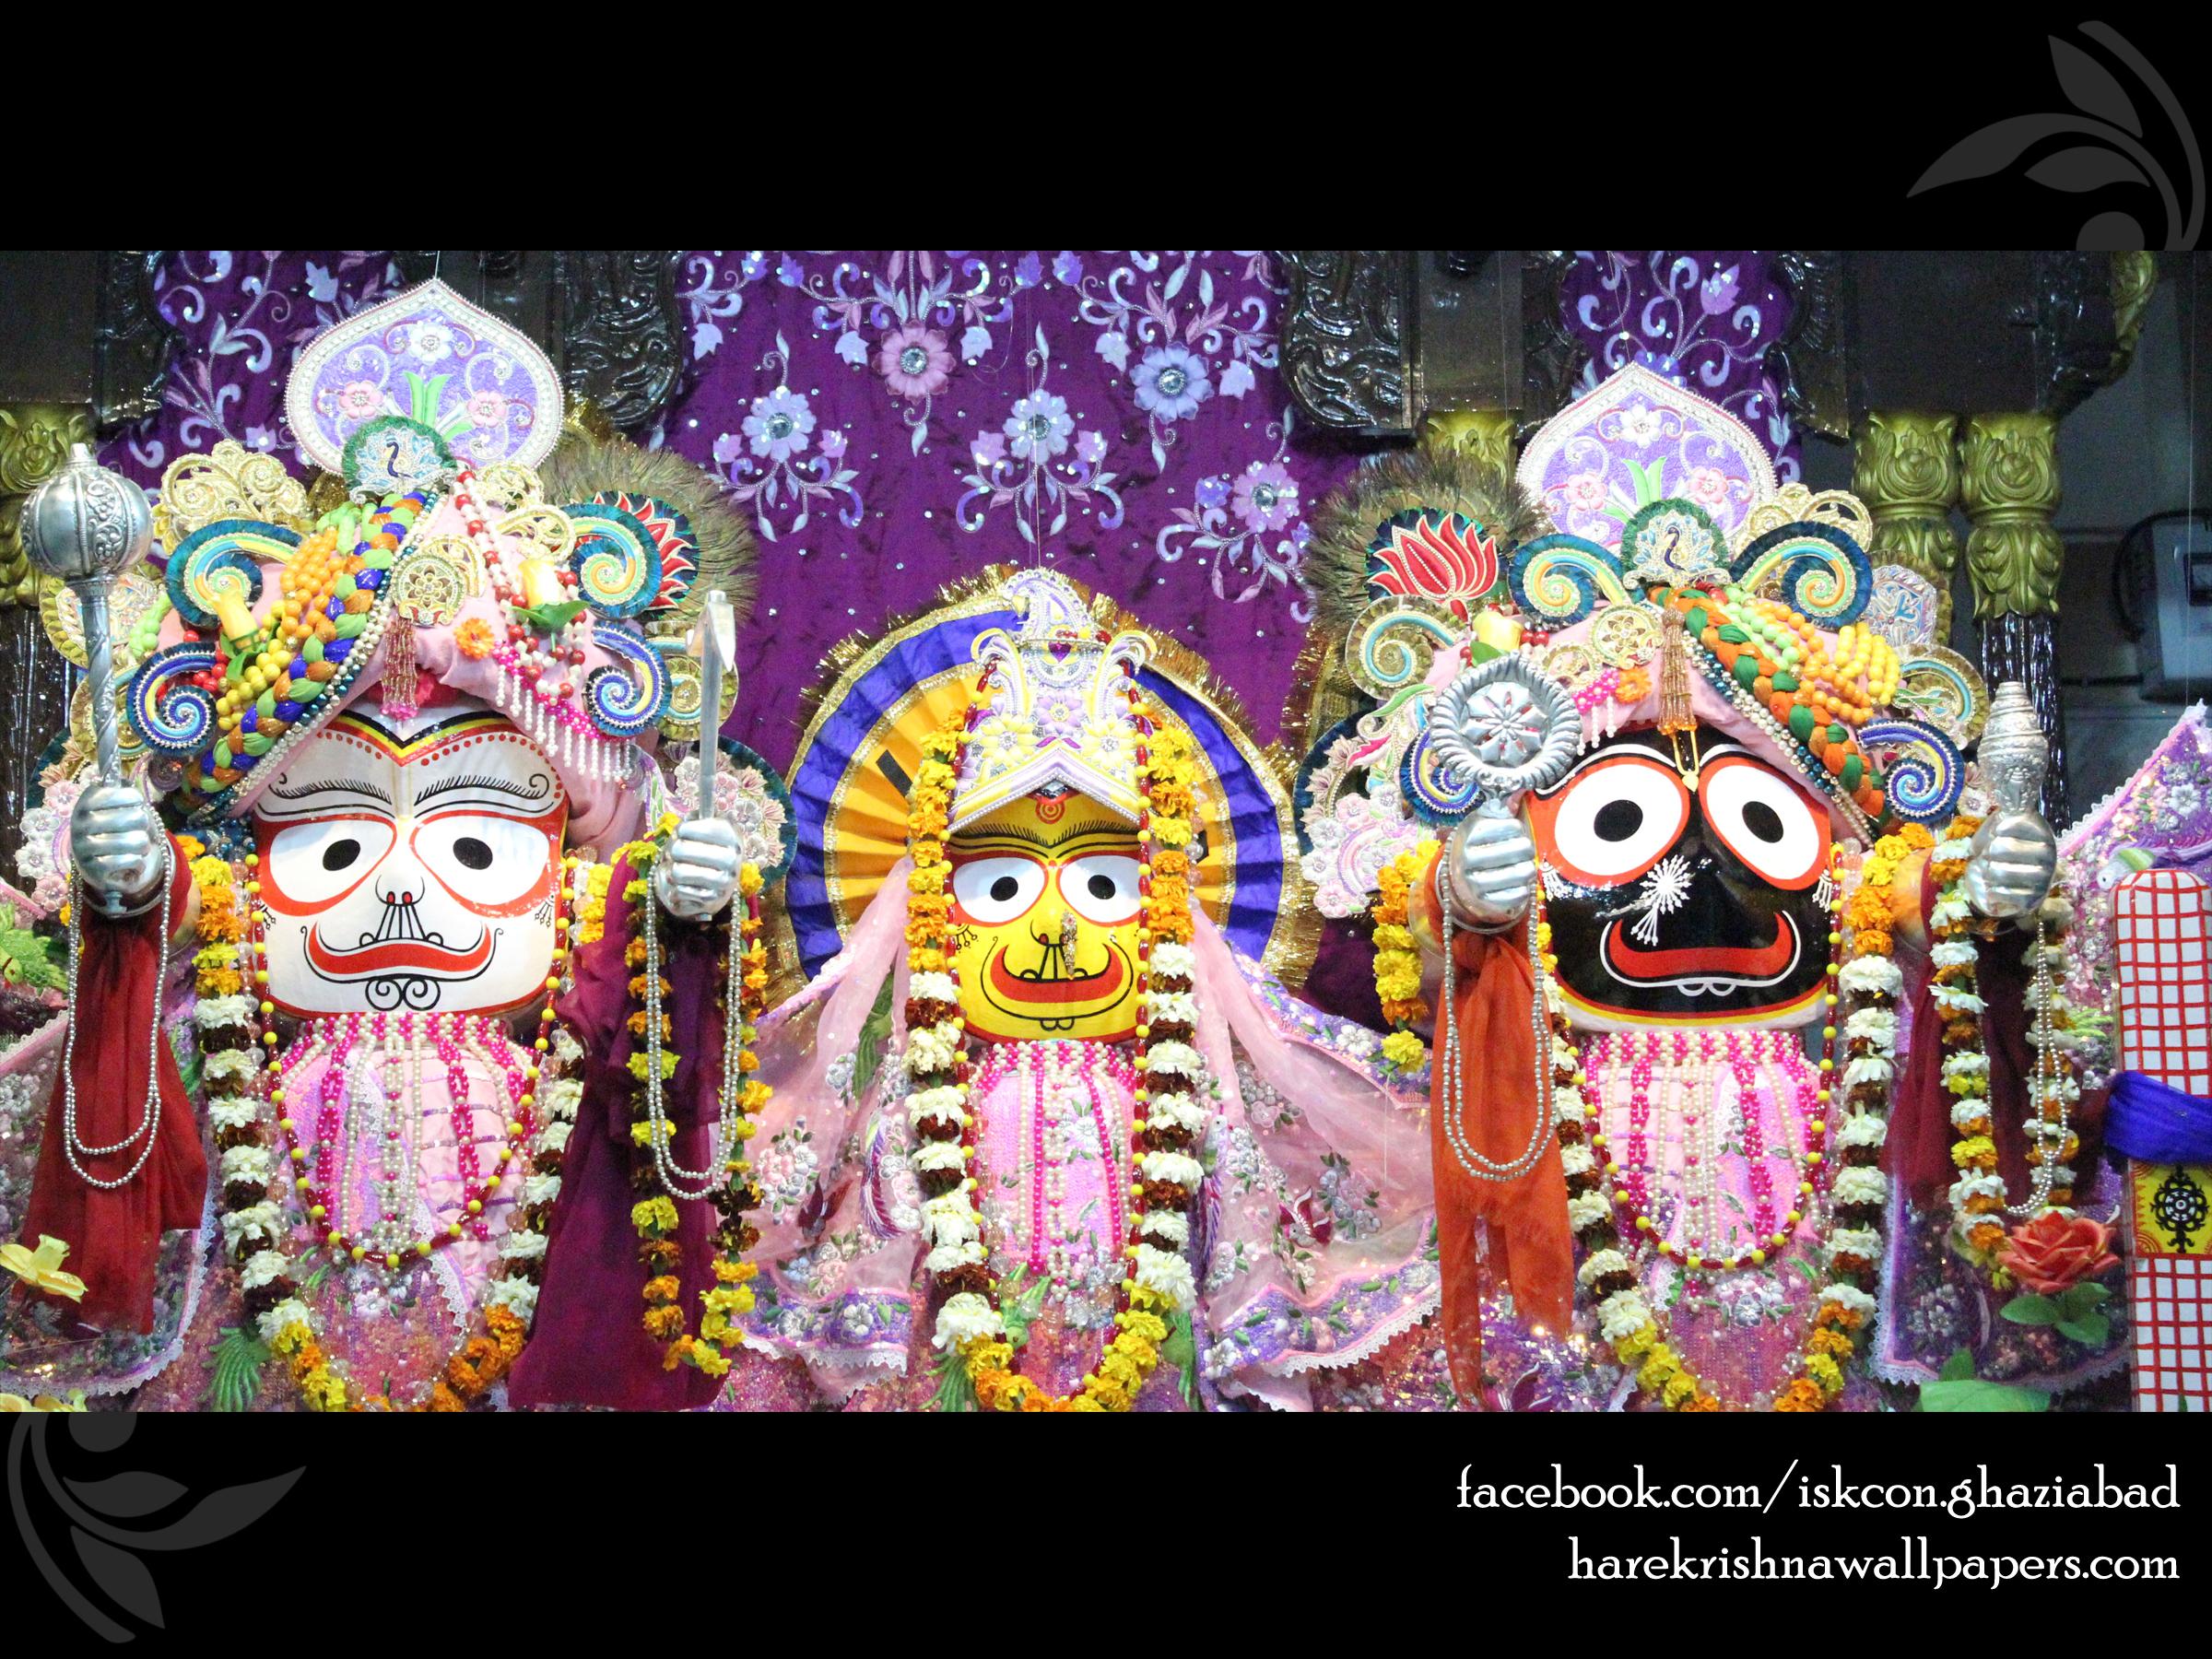 Jagannath Baladeva Subhadra Wallpaper (004) Size 2400x1800 Download